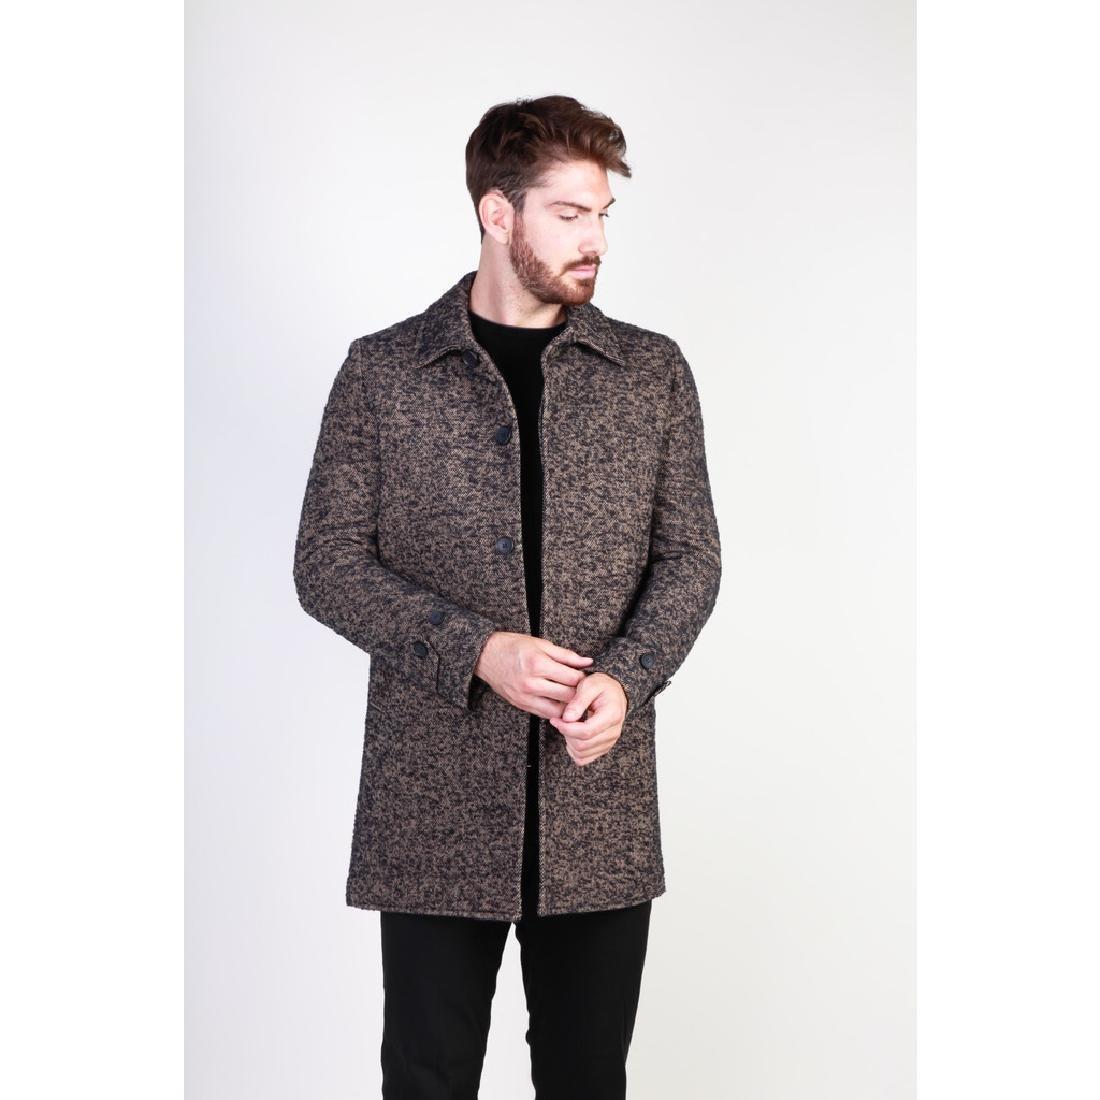 New Men's Italian Wool Blend Coat US 38